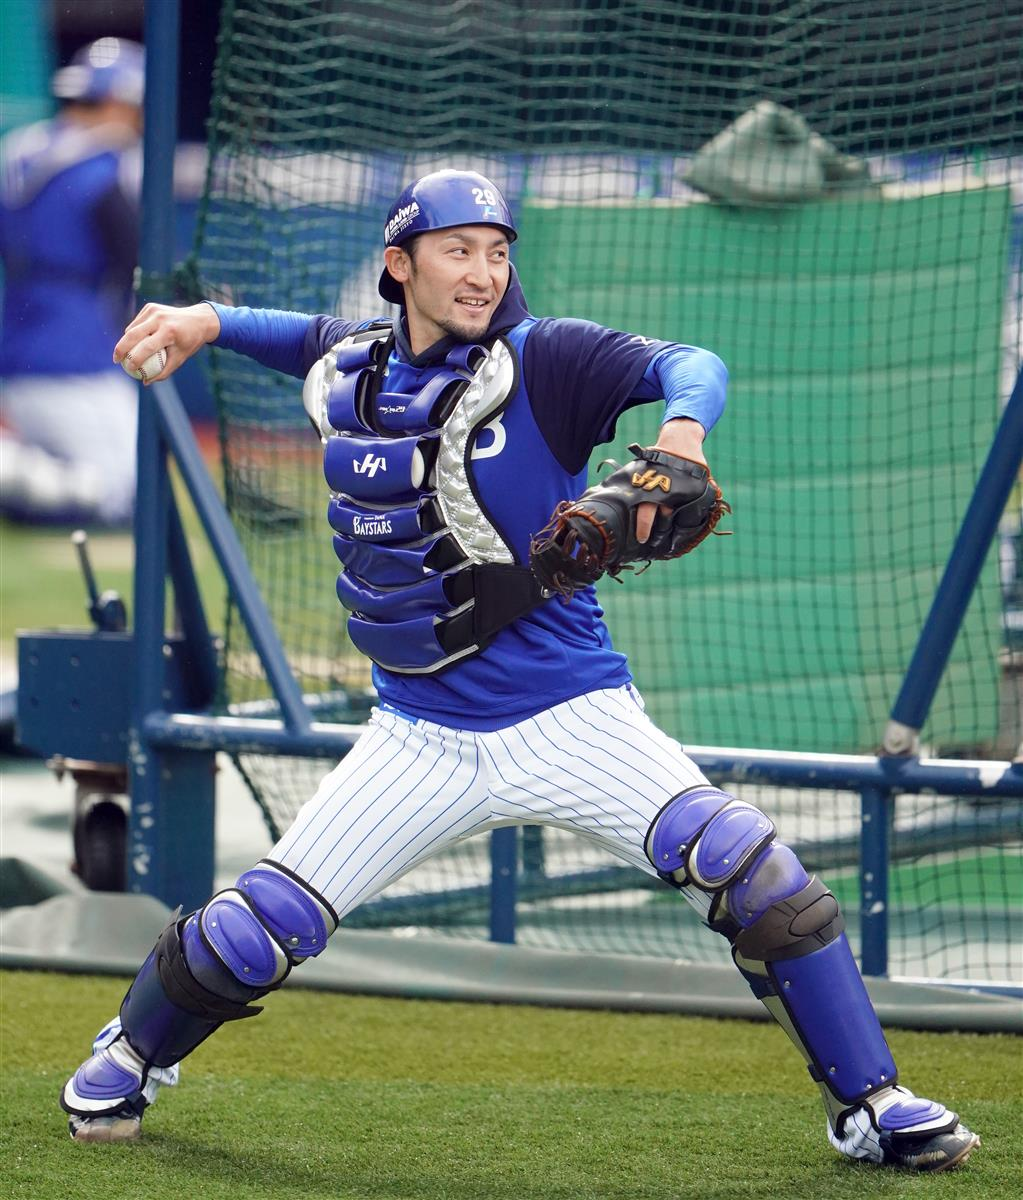 DeNA・伊藤光が正捕手獲りへ意欲 「勝てる捕手が一番。それが信頼につながる」 - サンスポ